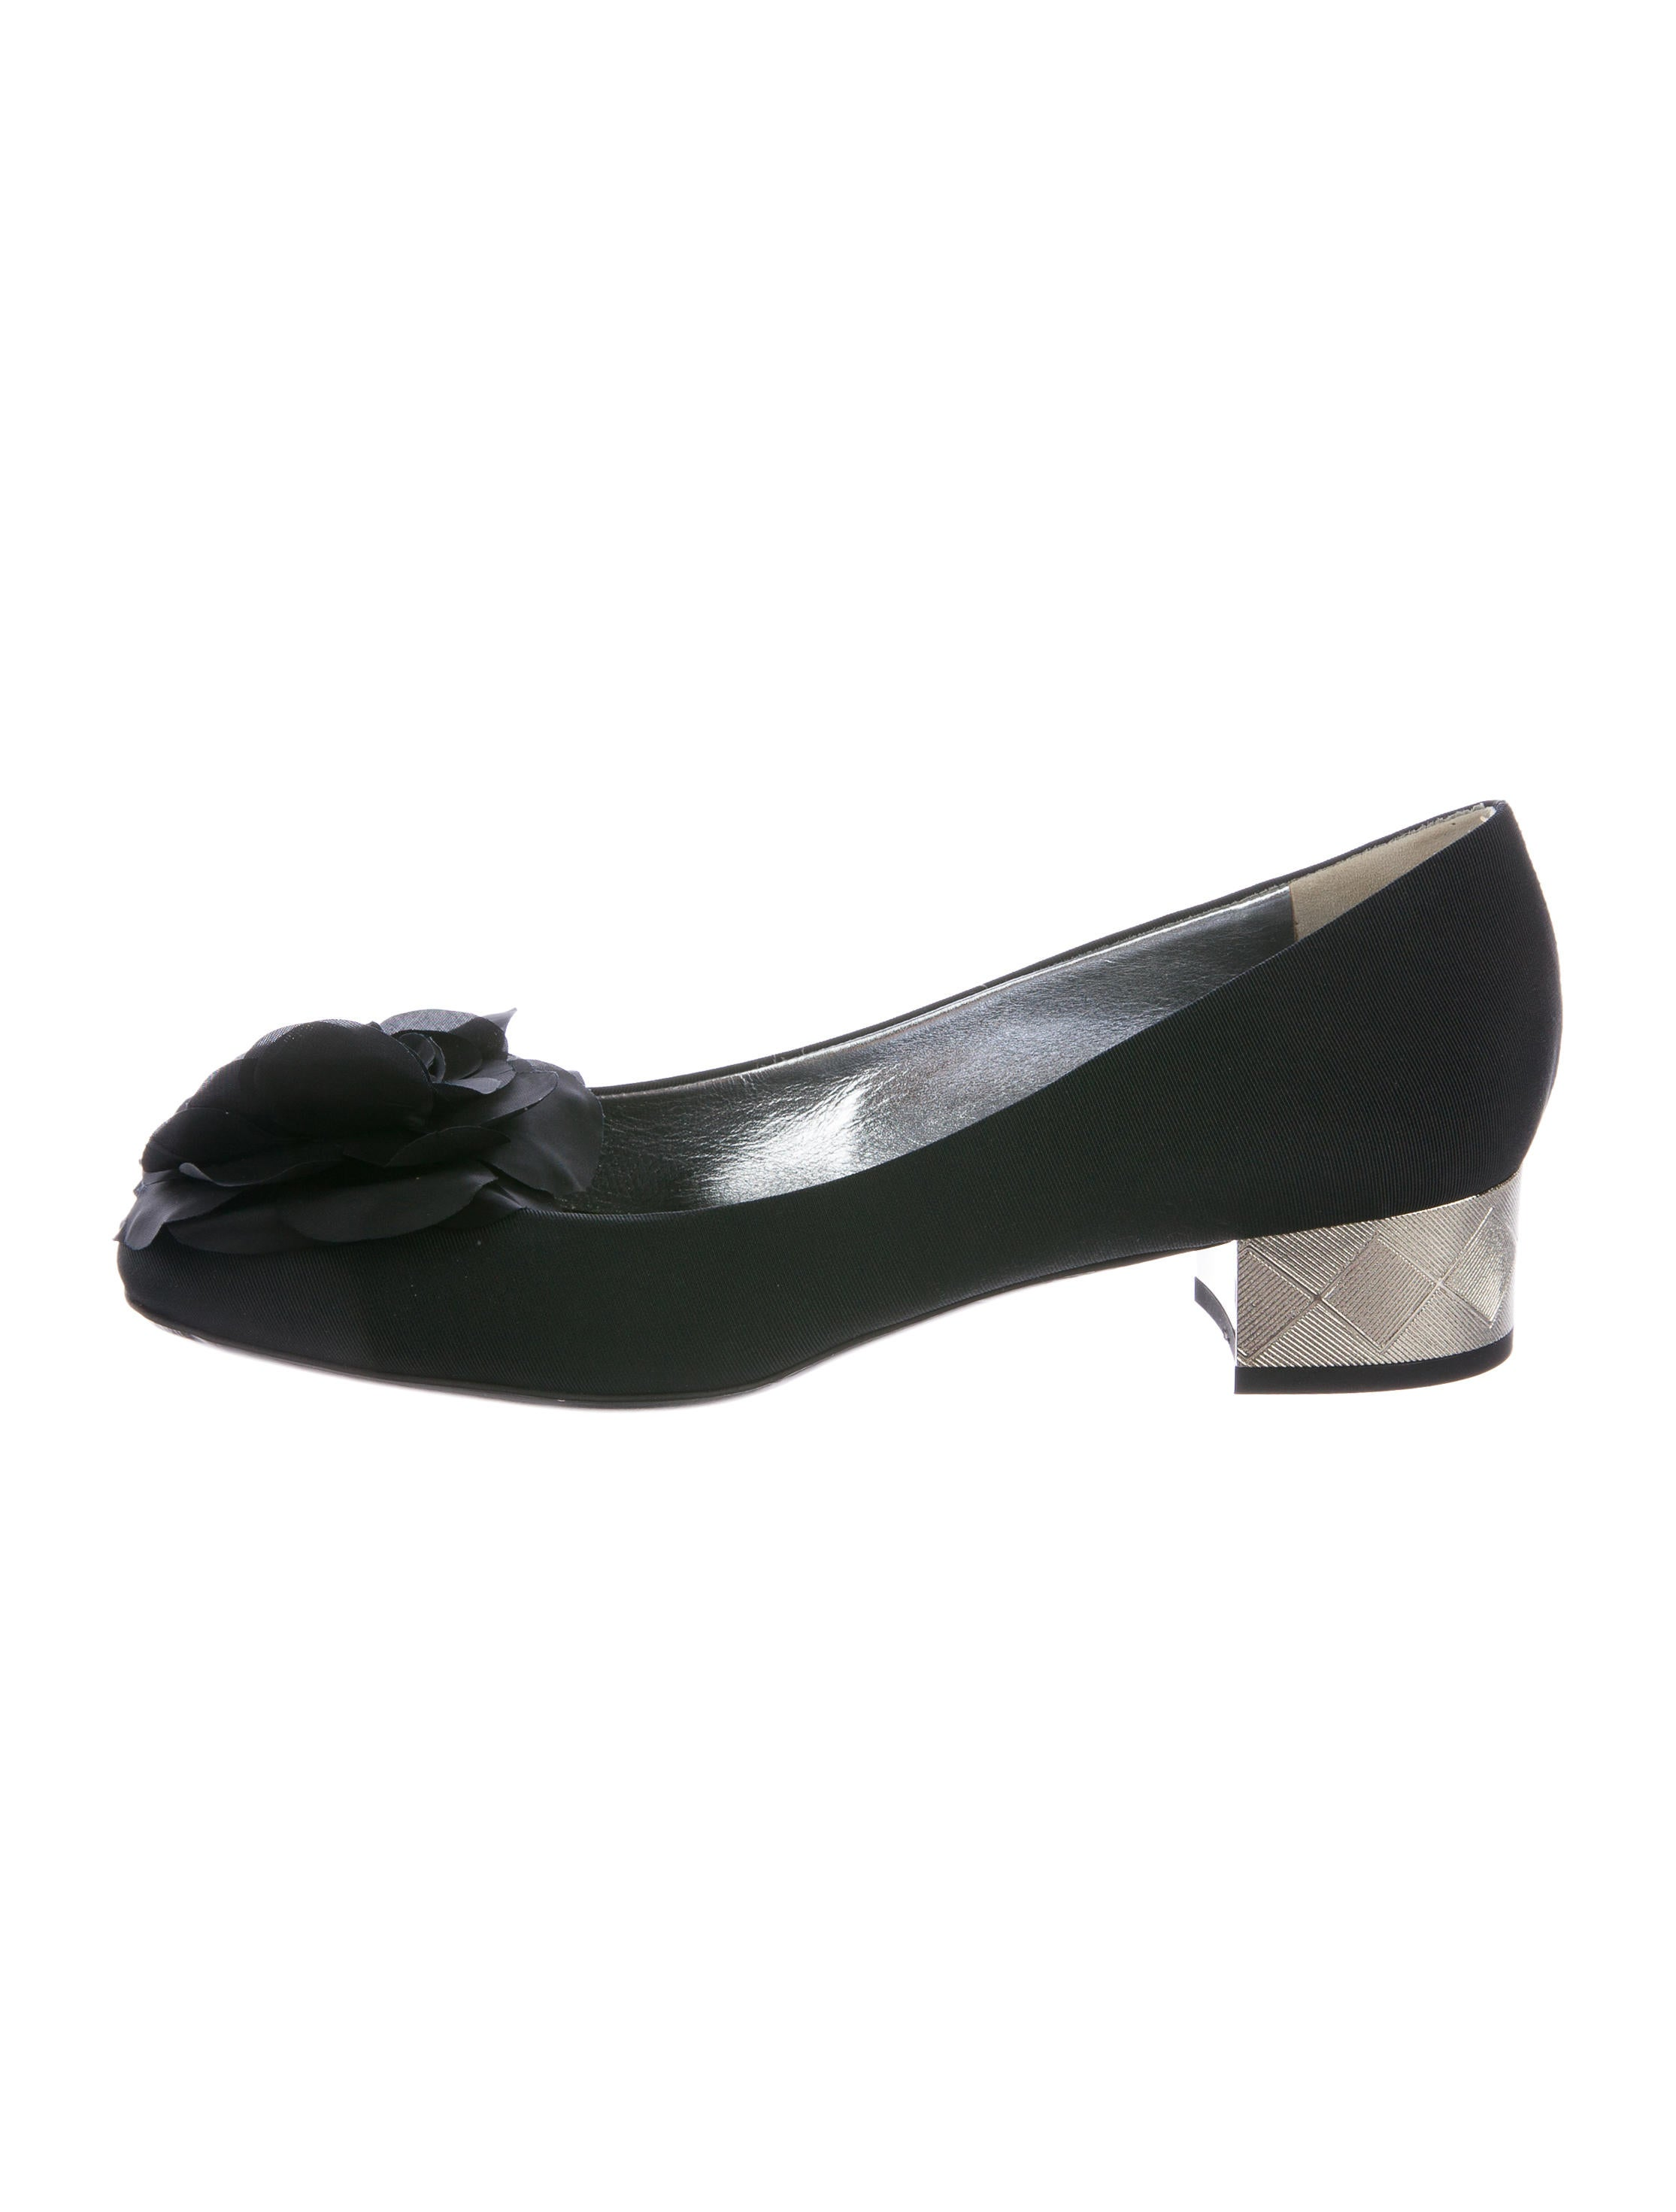 c0c36ebf60d Chanel Woven Camellia Pumps w  Tags - Shoes - CHA203788